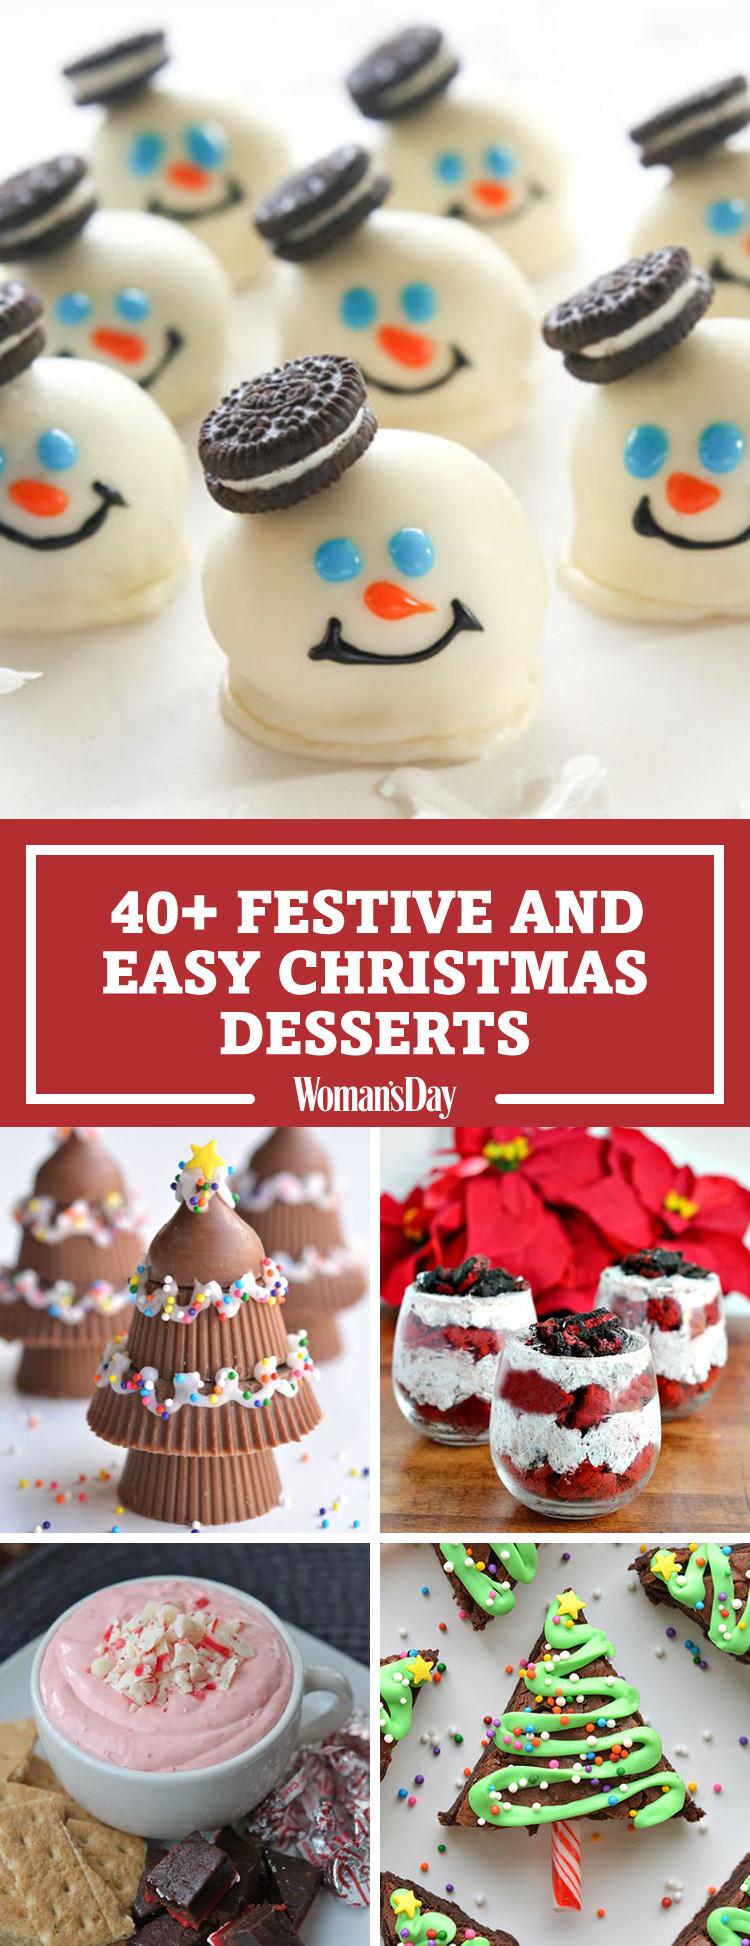 Simple Christmas Dessert  57 Easy Christmas Dessert Recipes Best Ideas for Fun